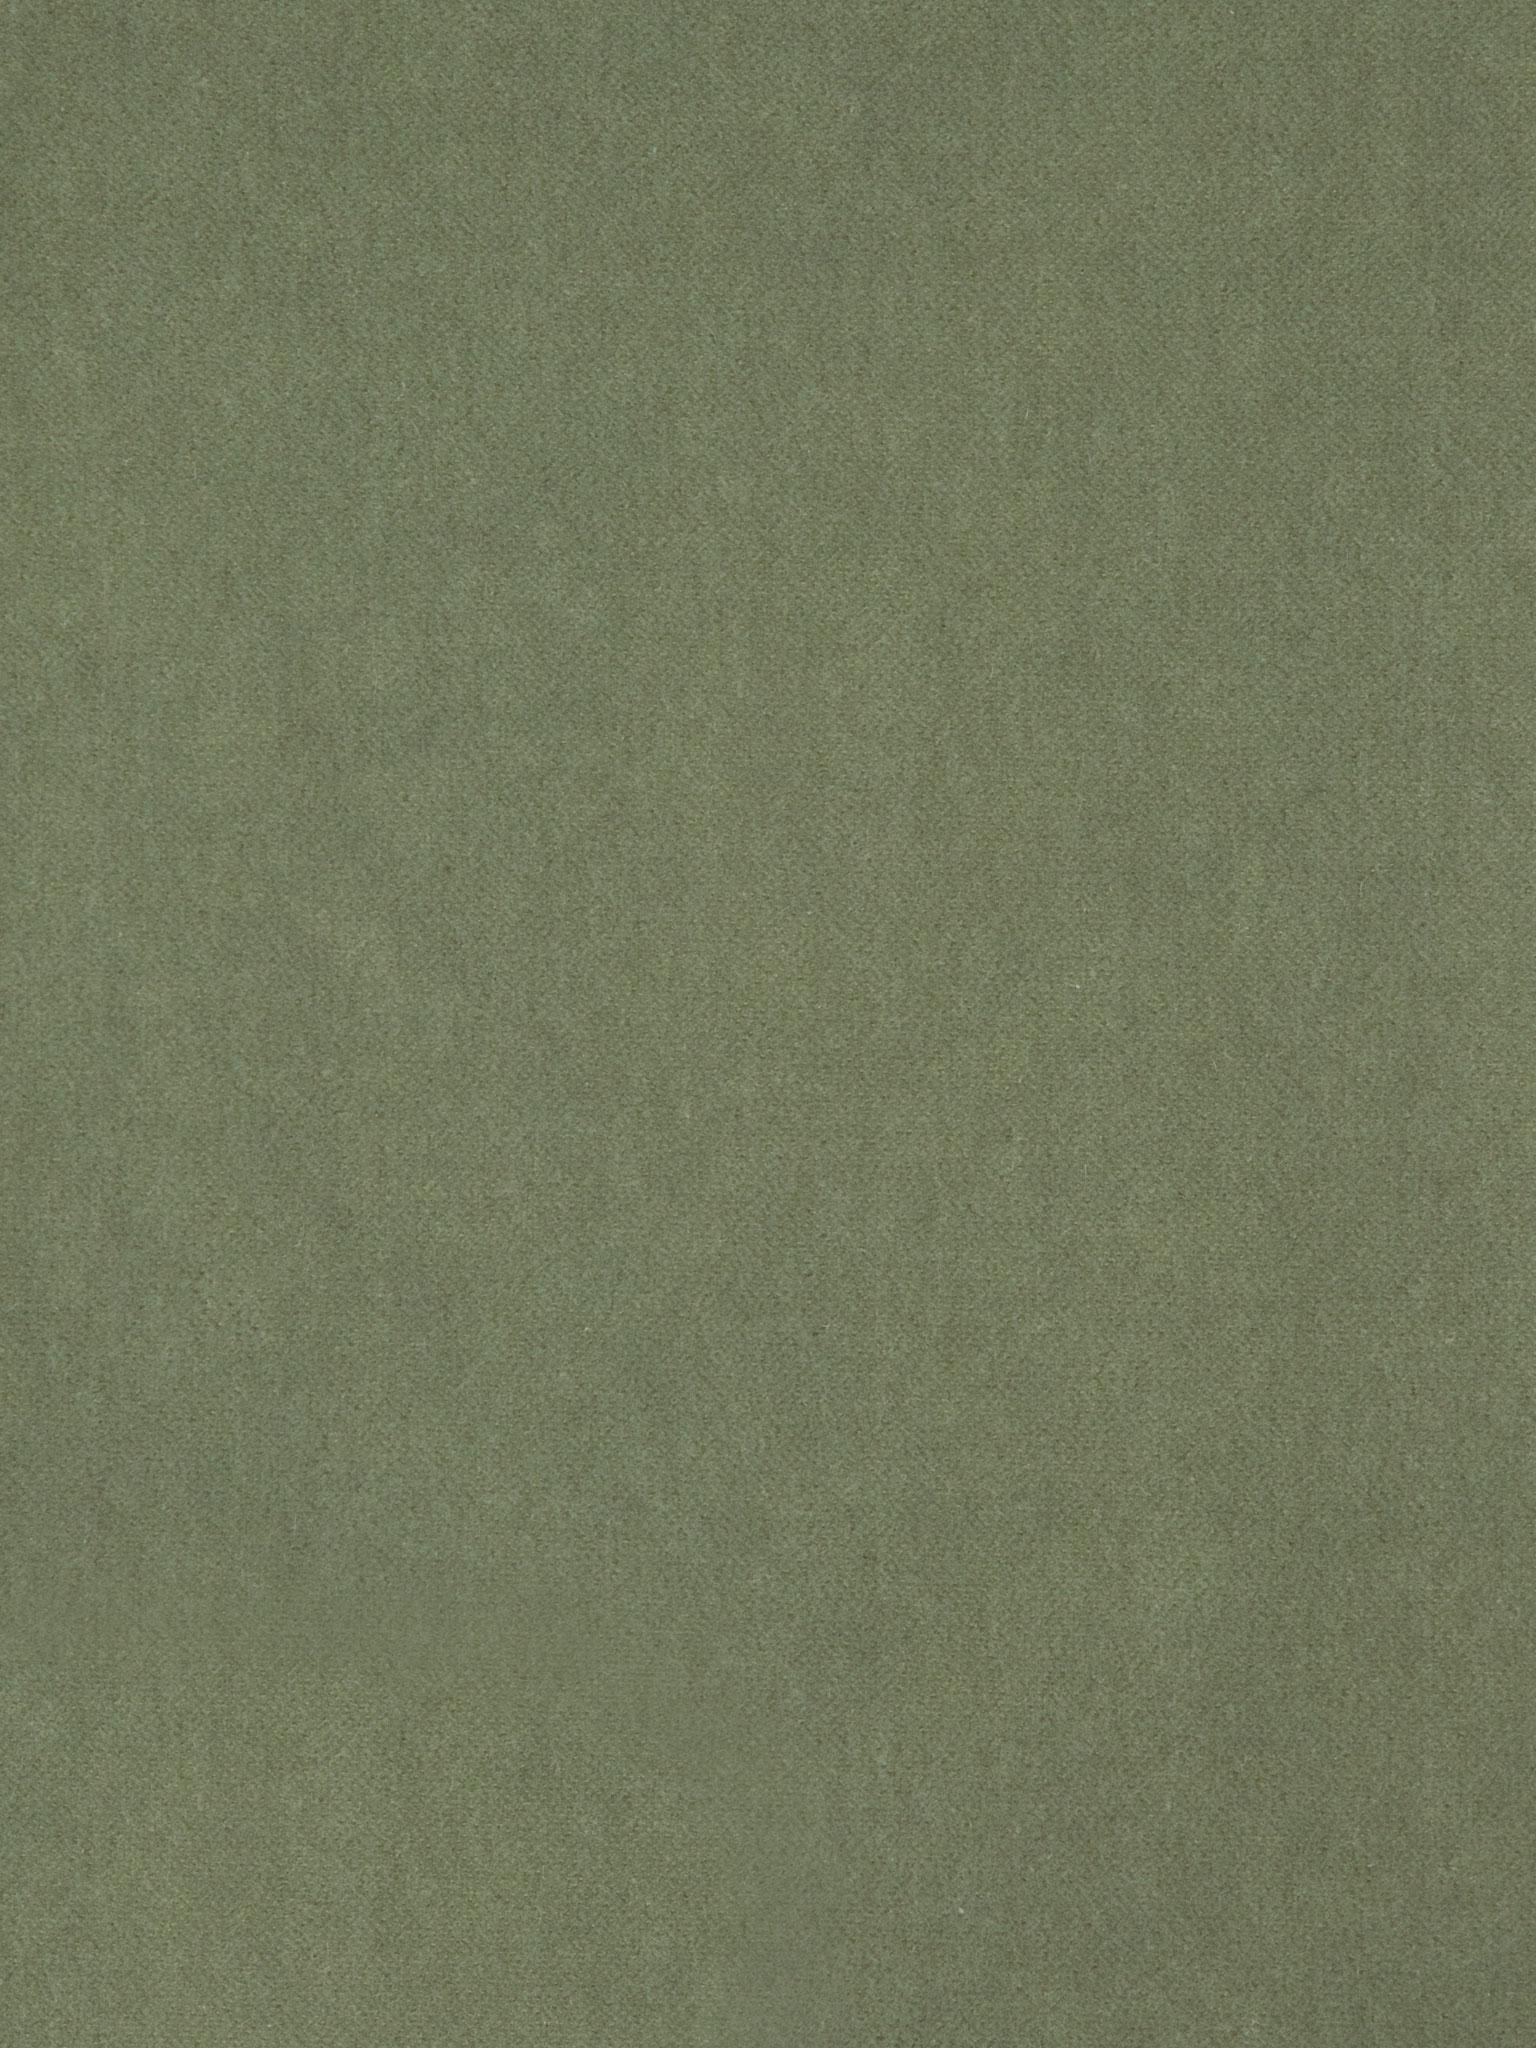 RIVE GAUCHE DE11536